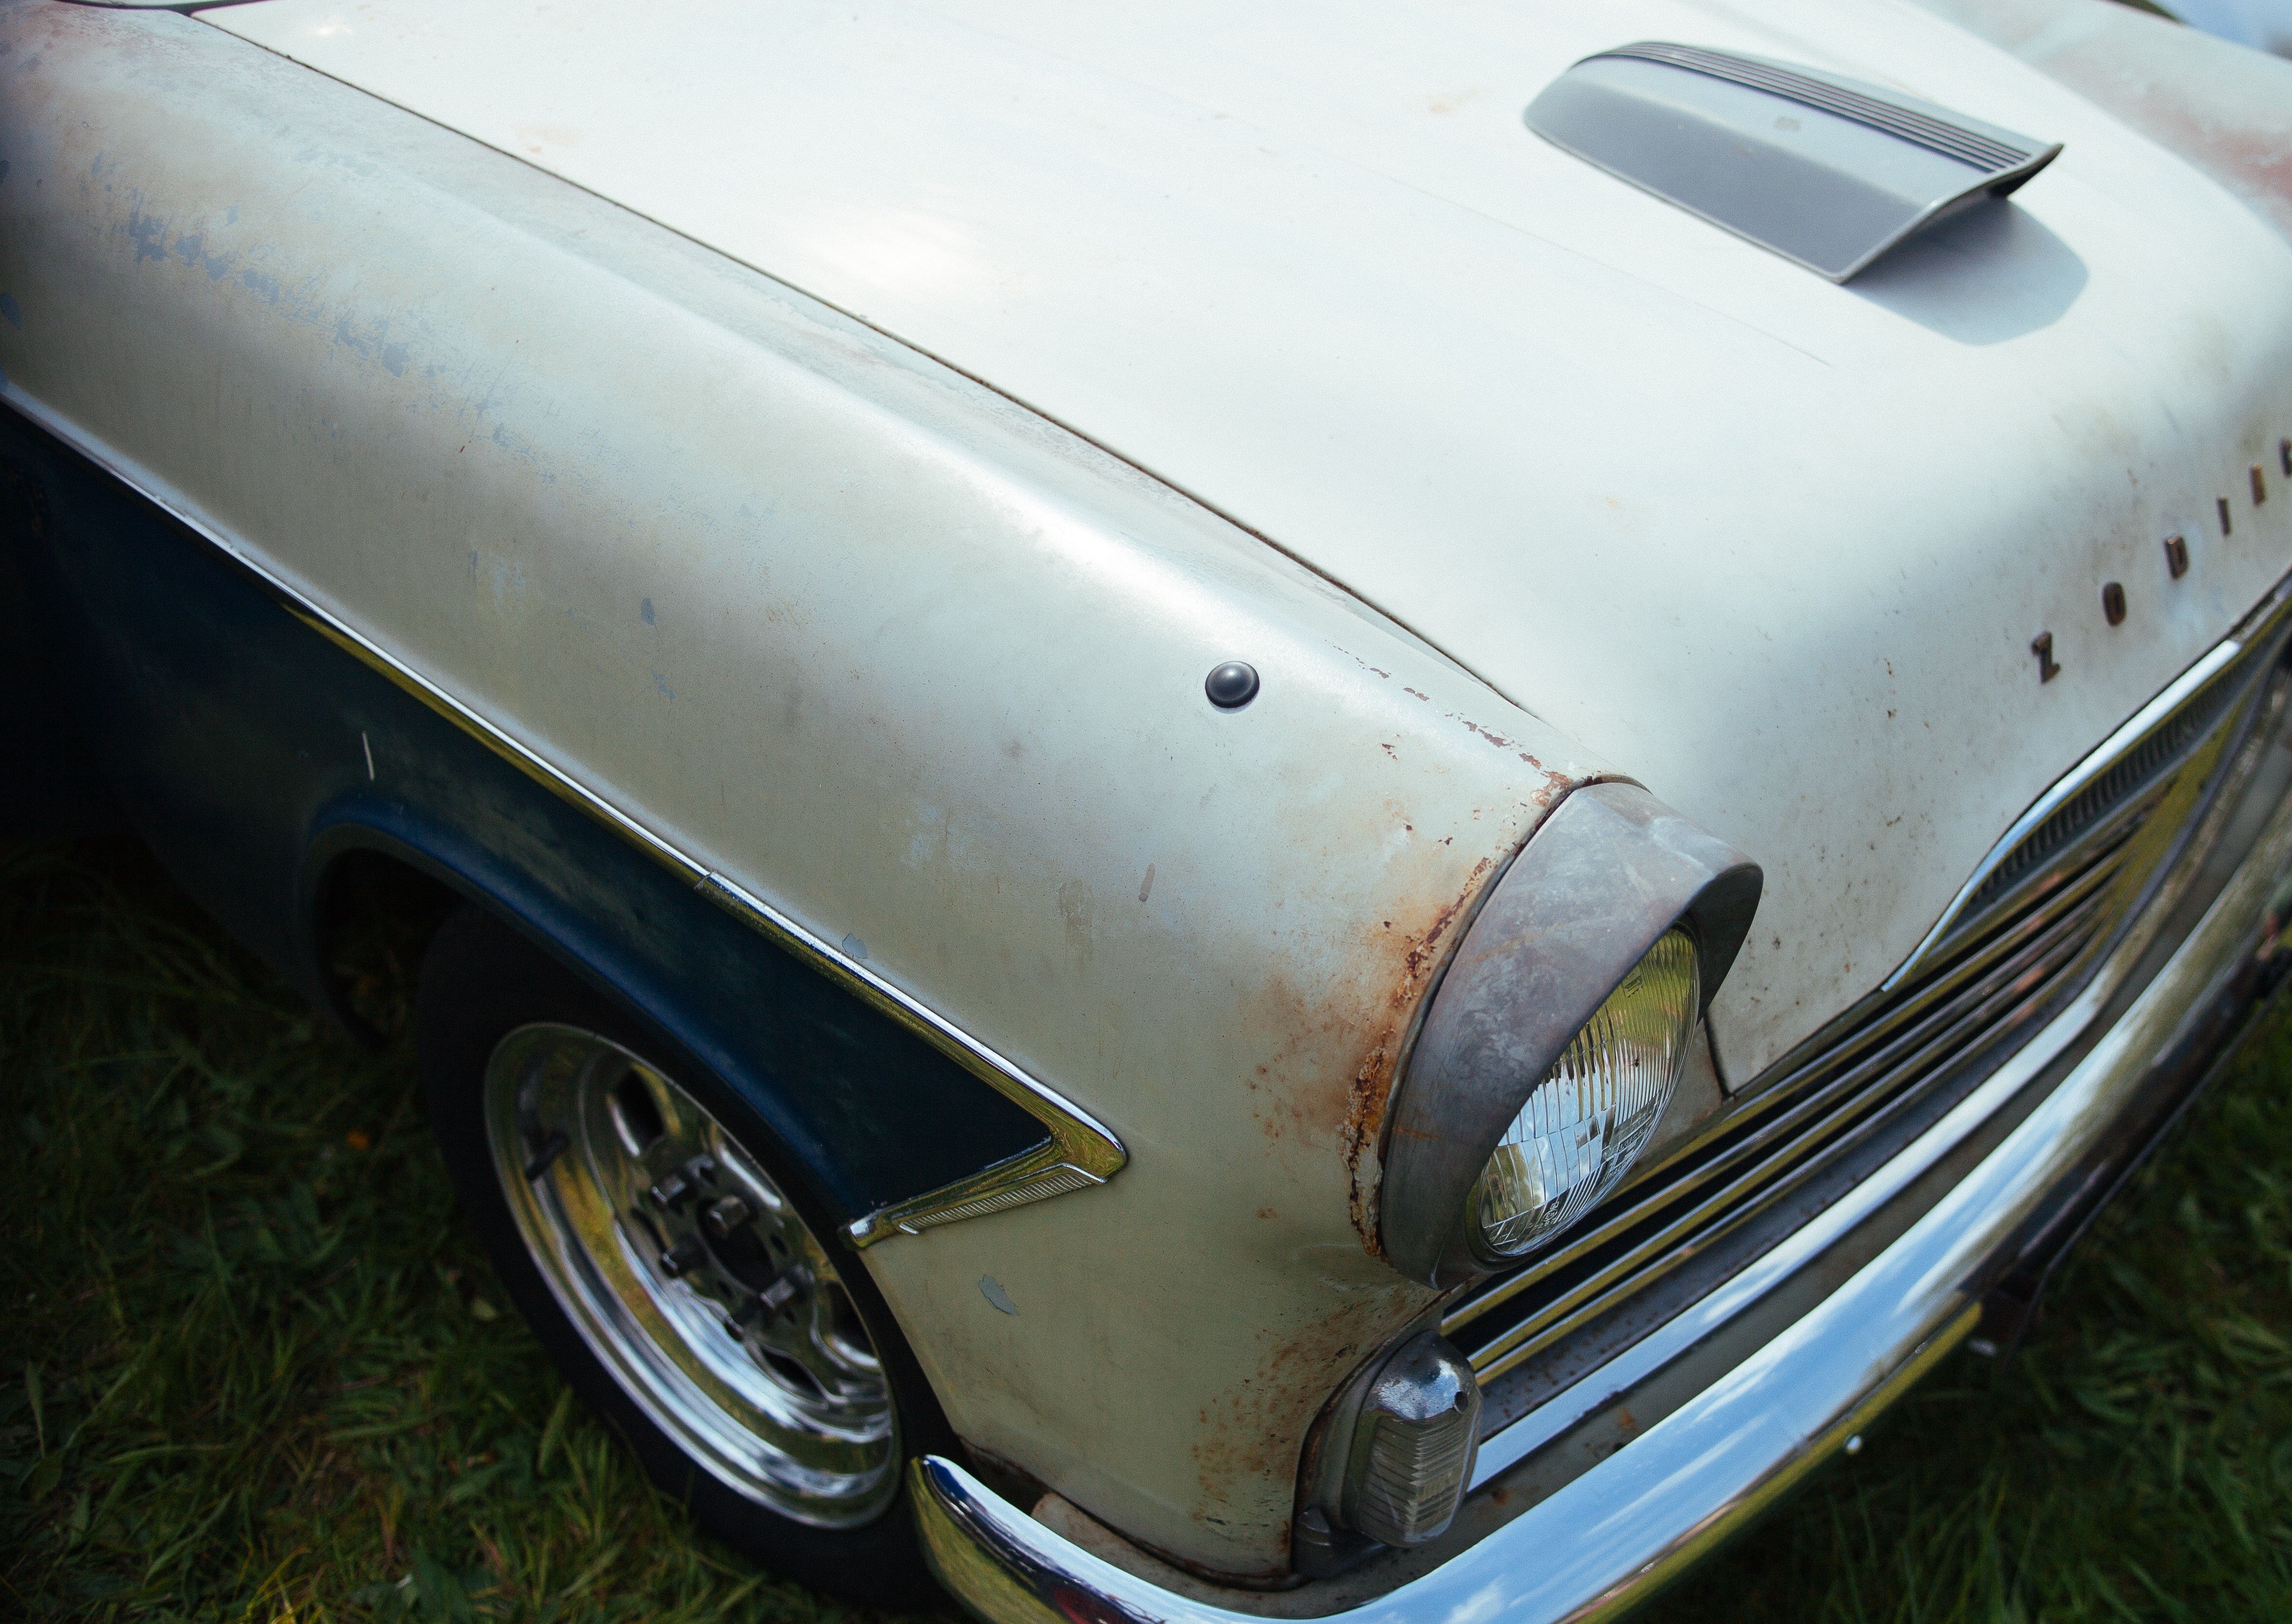 A rusty white vintage car.